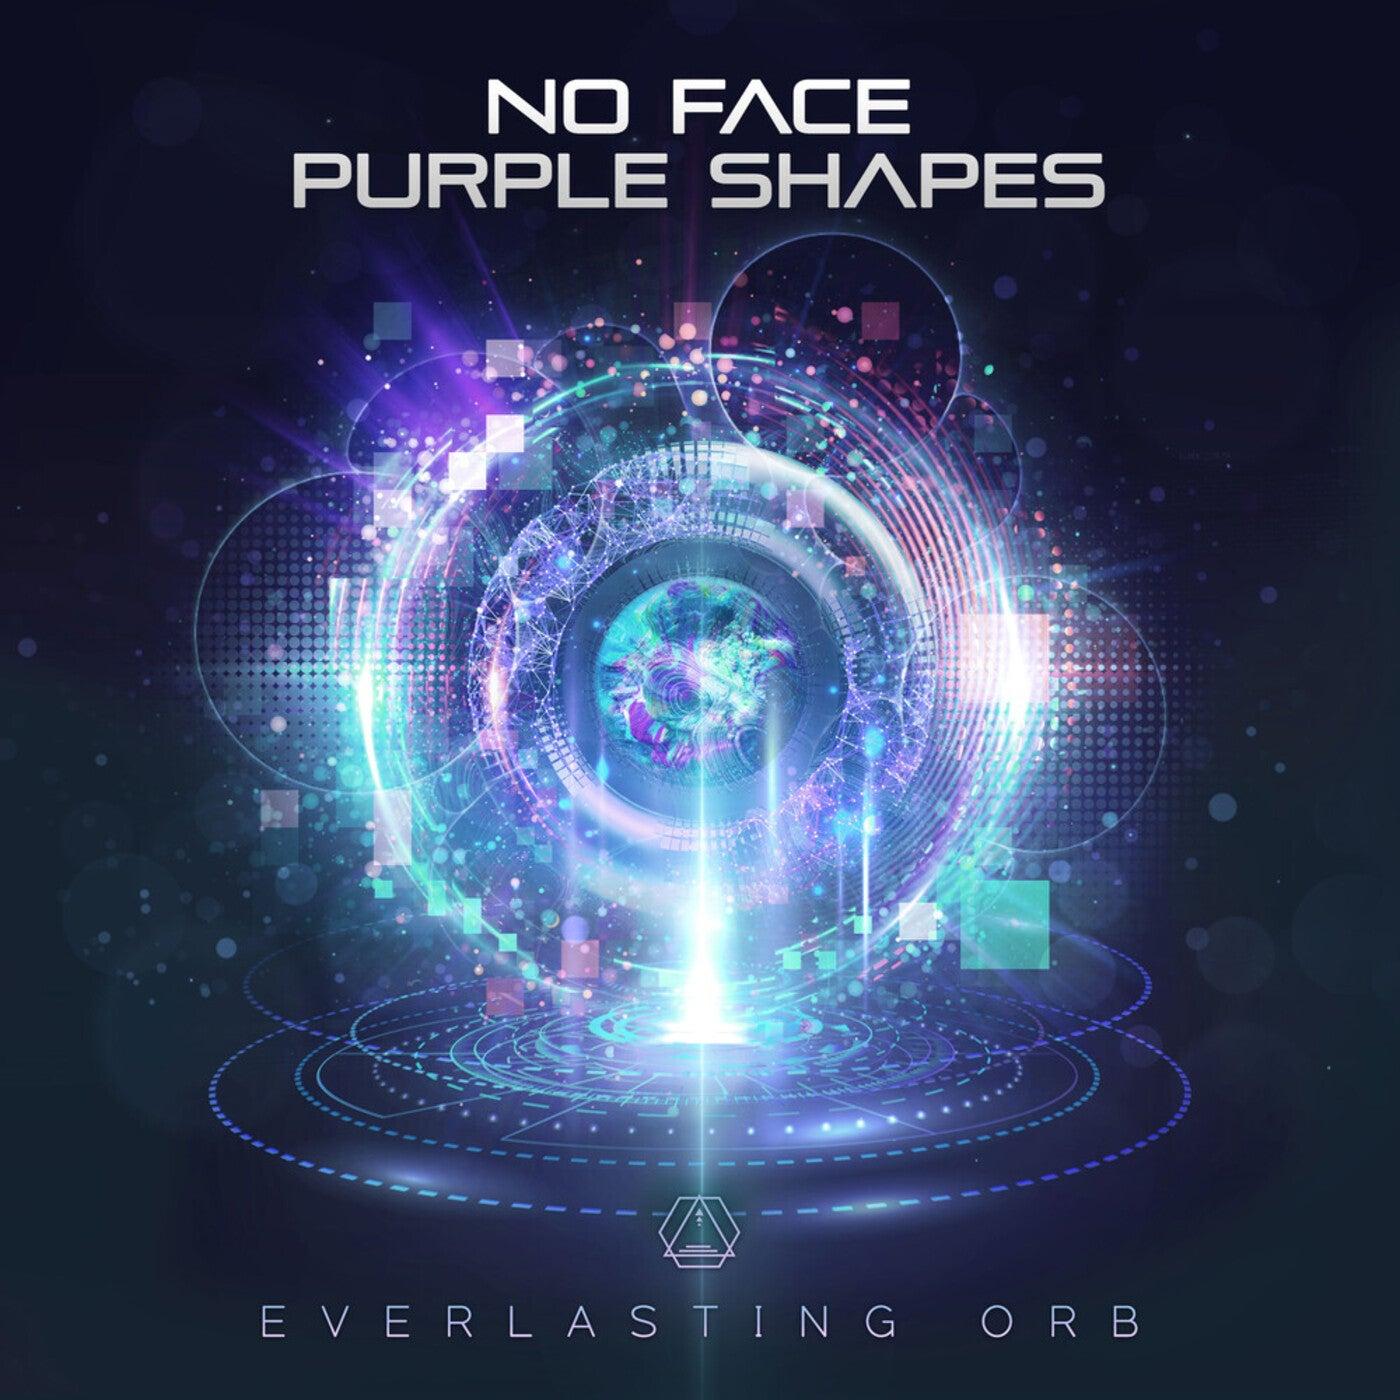 Everlasting Orb (Original Mix)